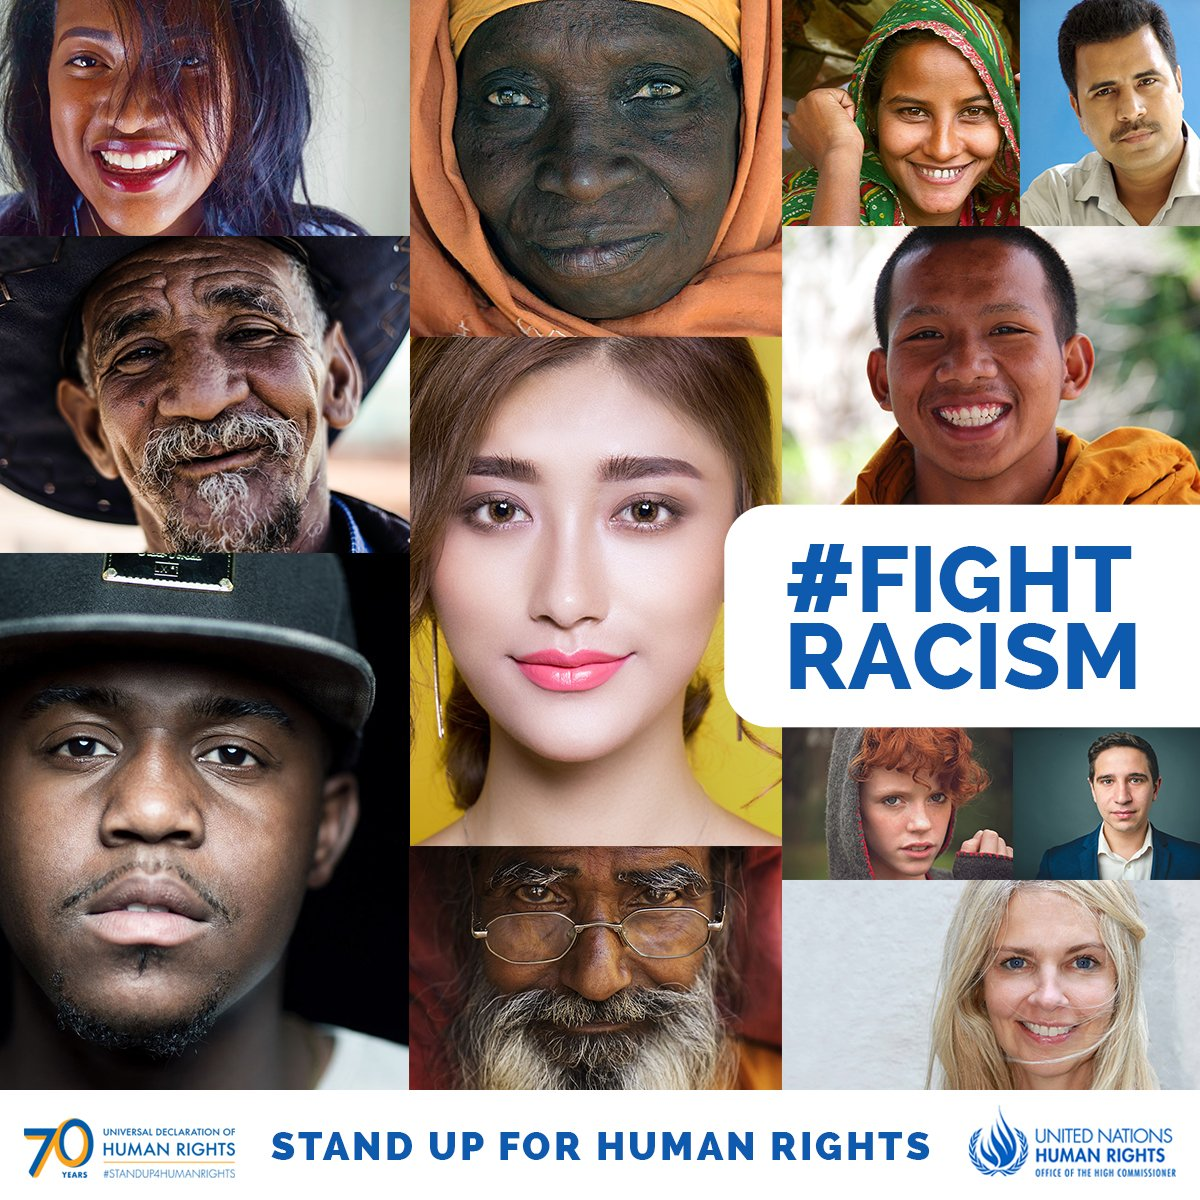 UN_Fight_Racism.jpg